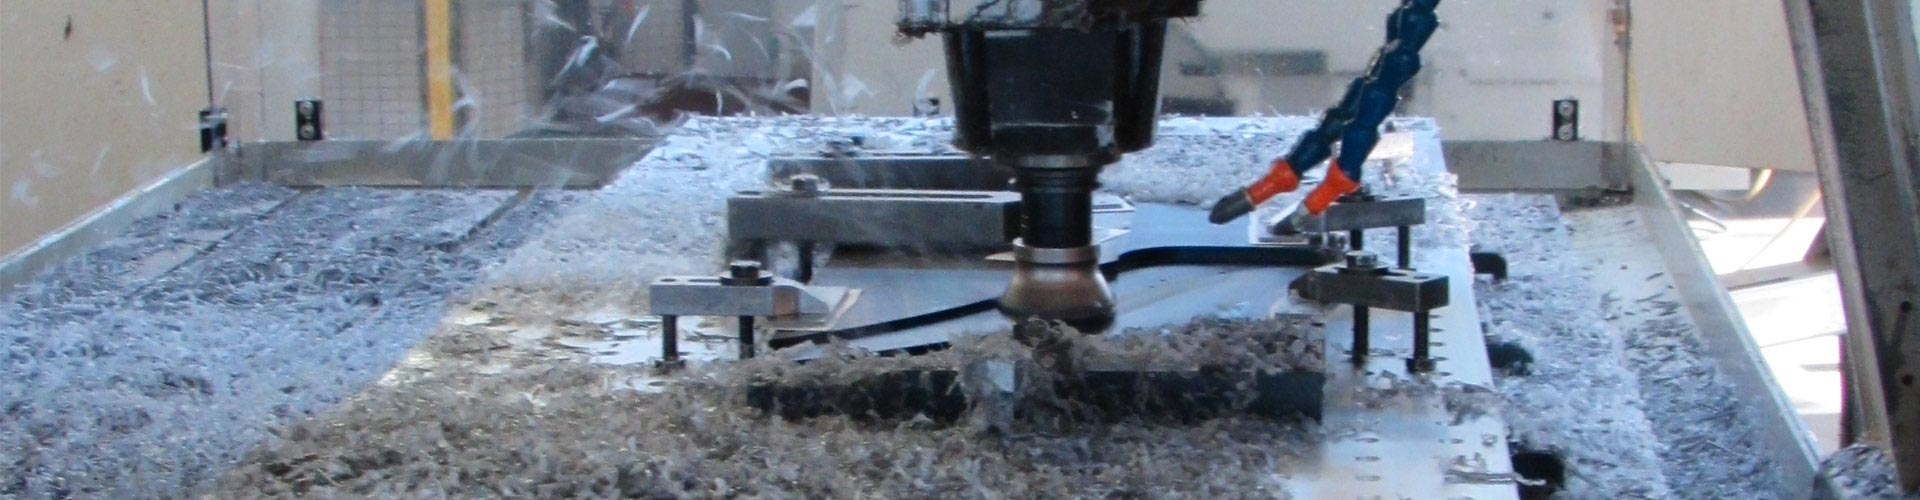 Plattenbearbeitung ASEDO in Dombühl